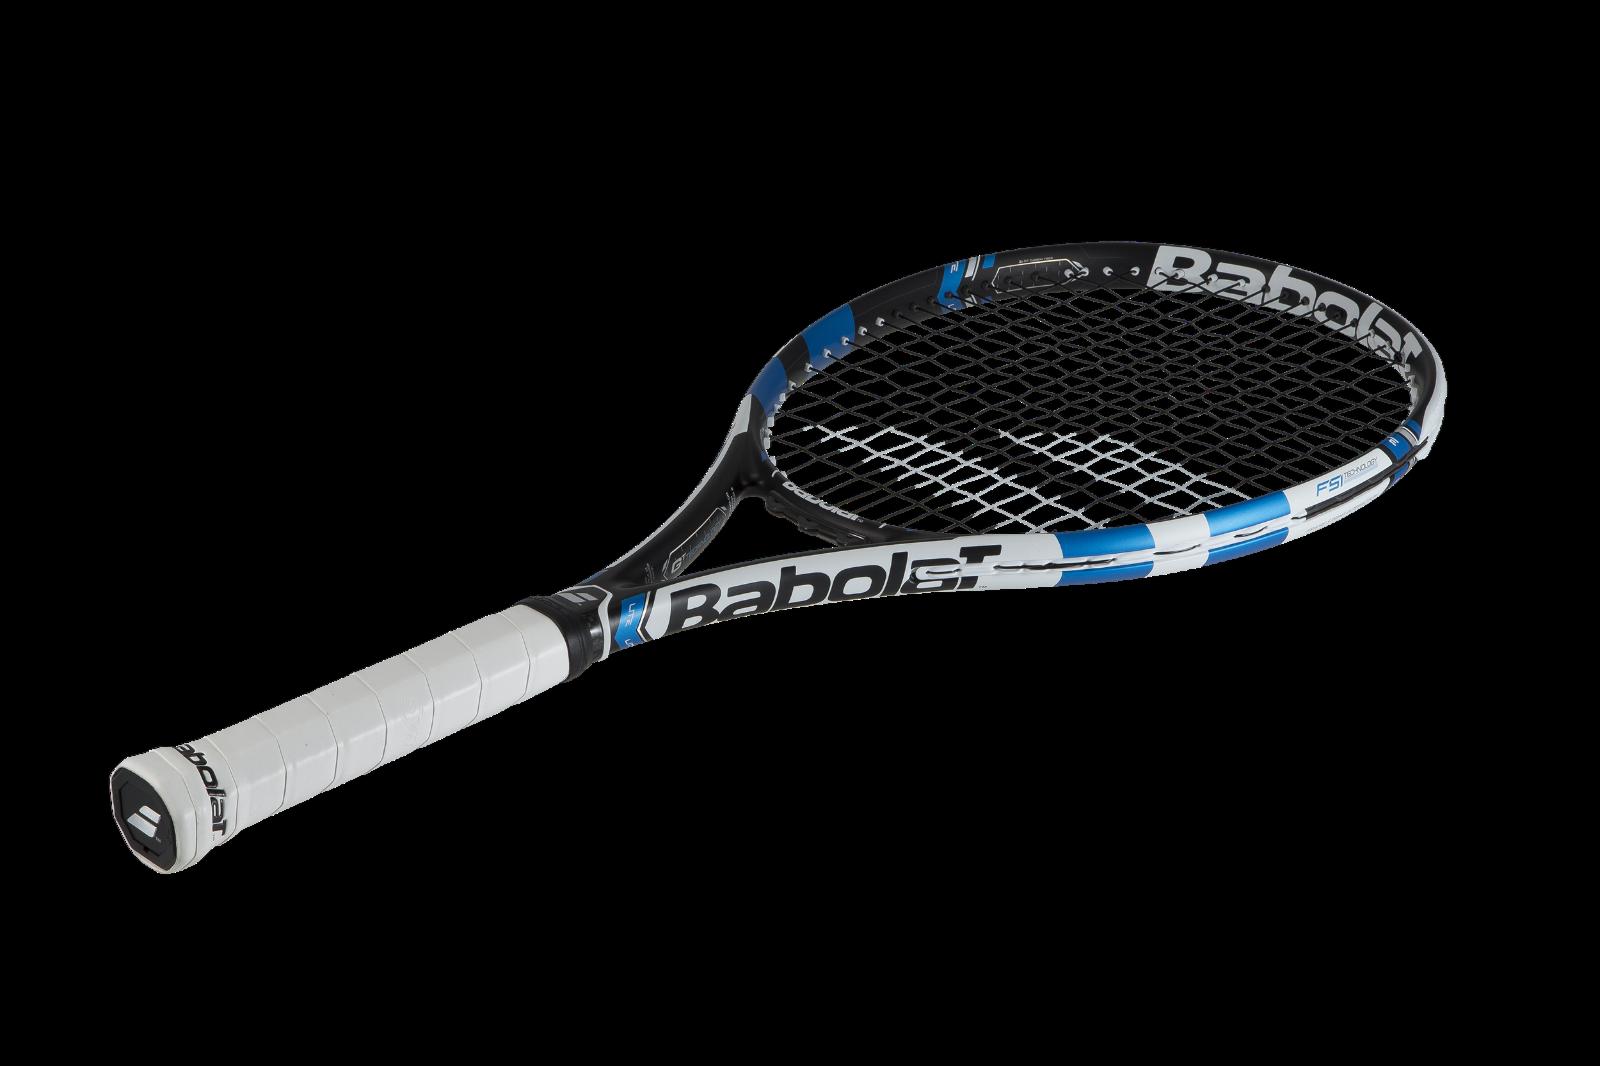 Babolat Babolat Babolat Pure Drive Super Lite 2015 Tennisschläger 7abcdf